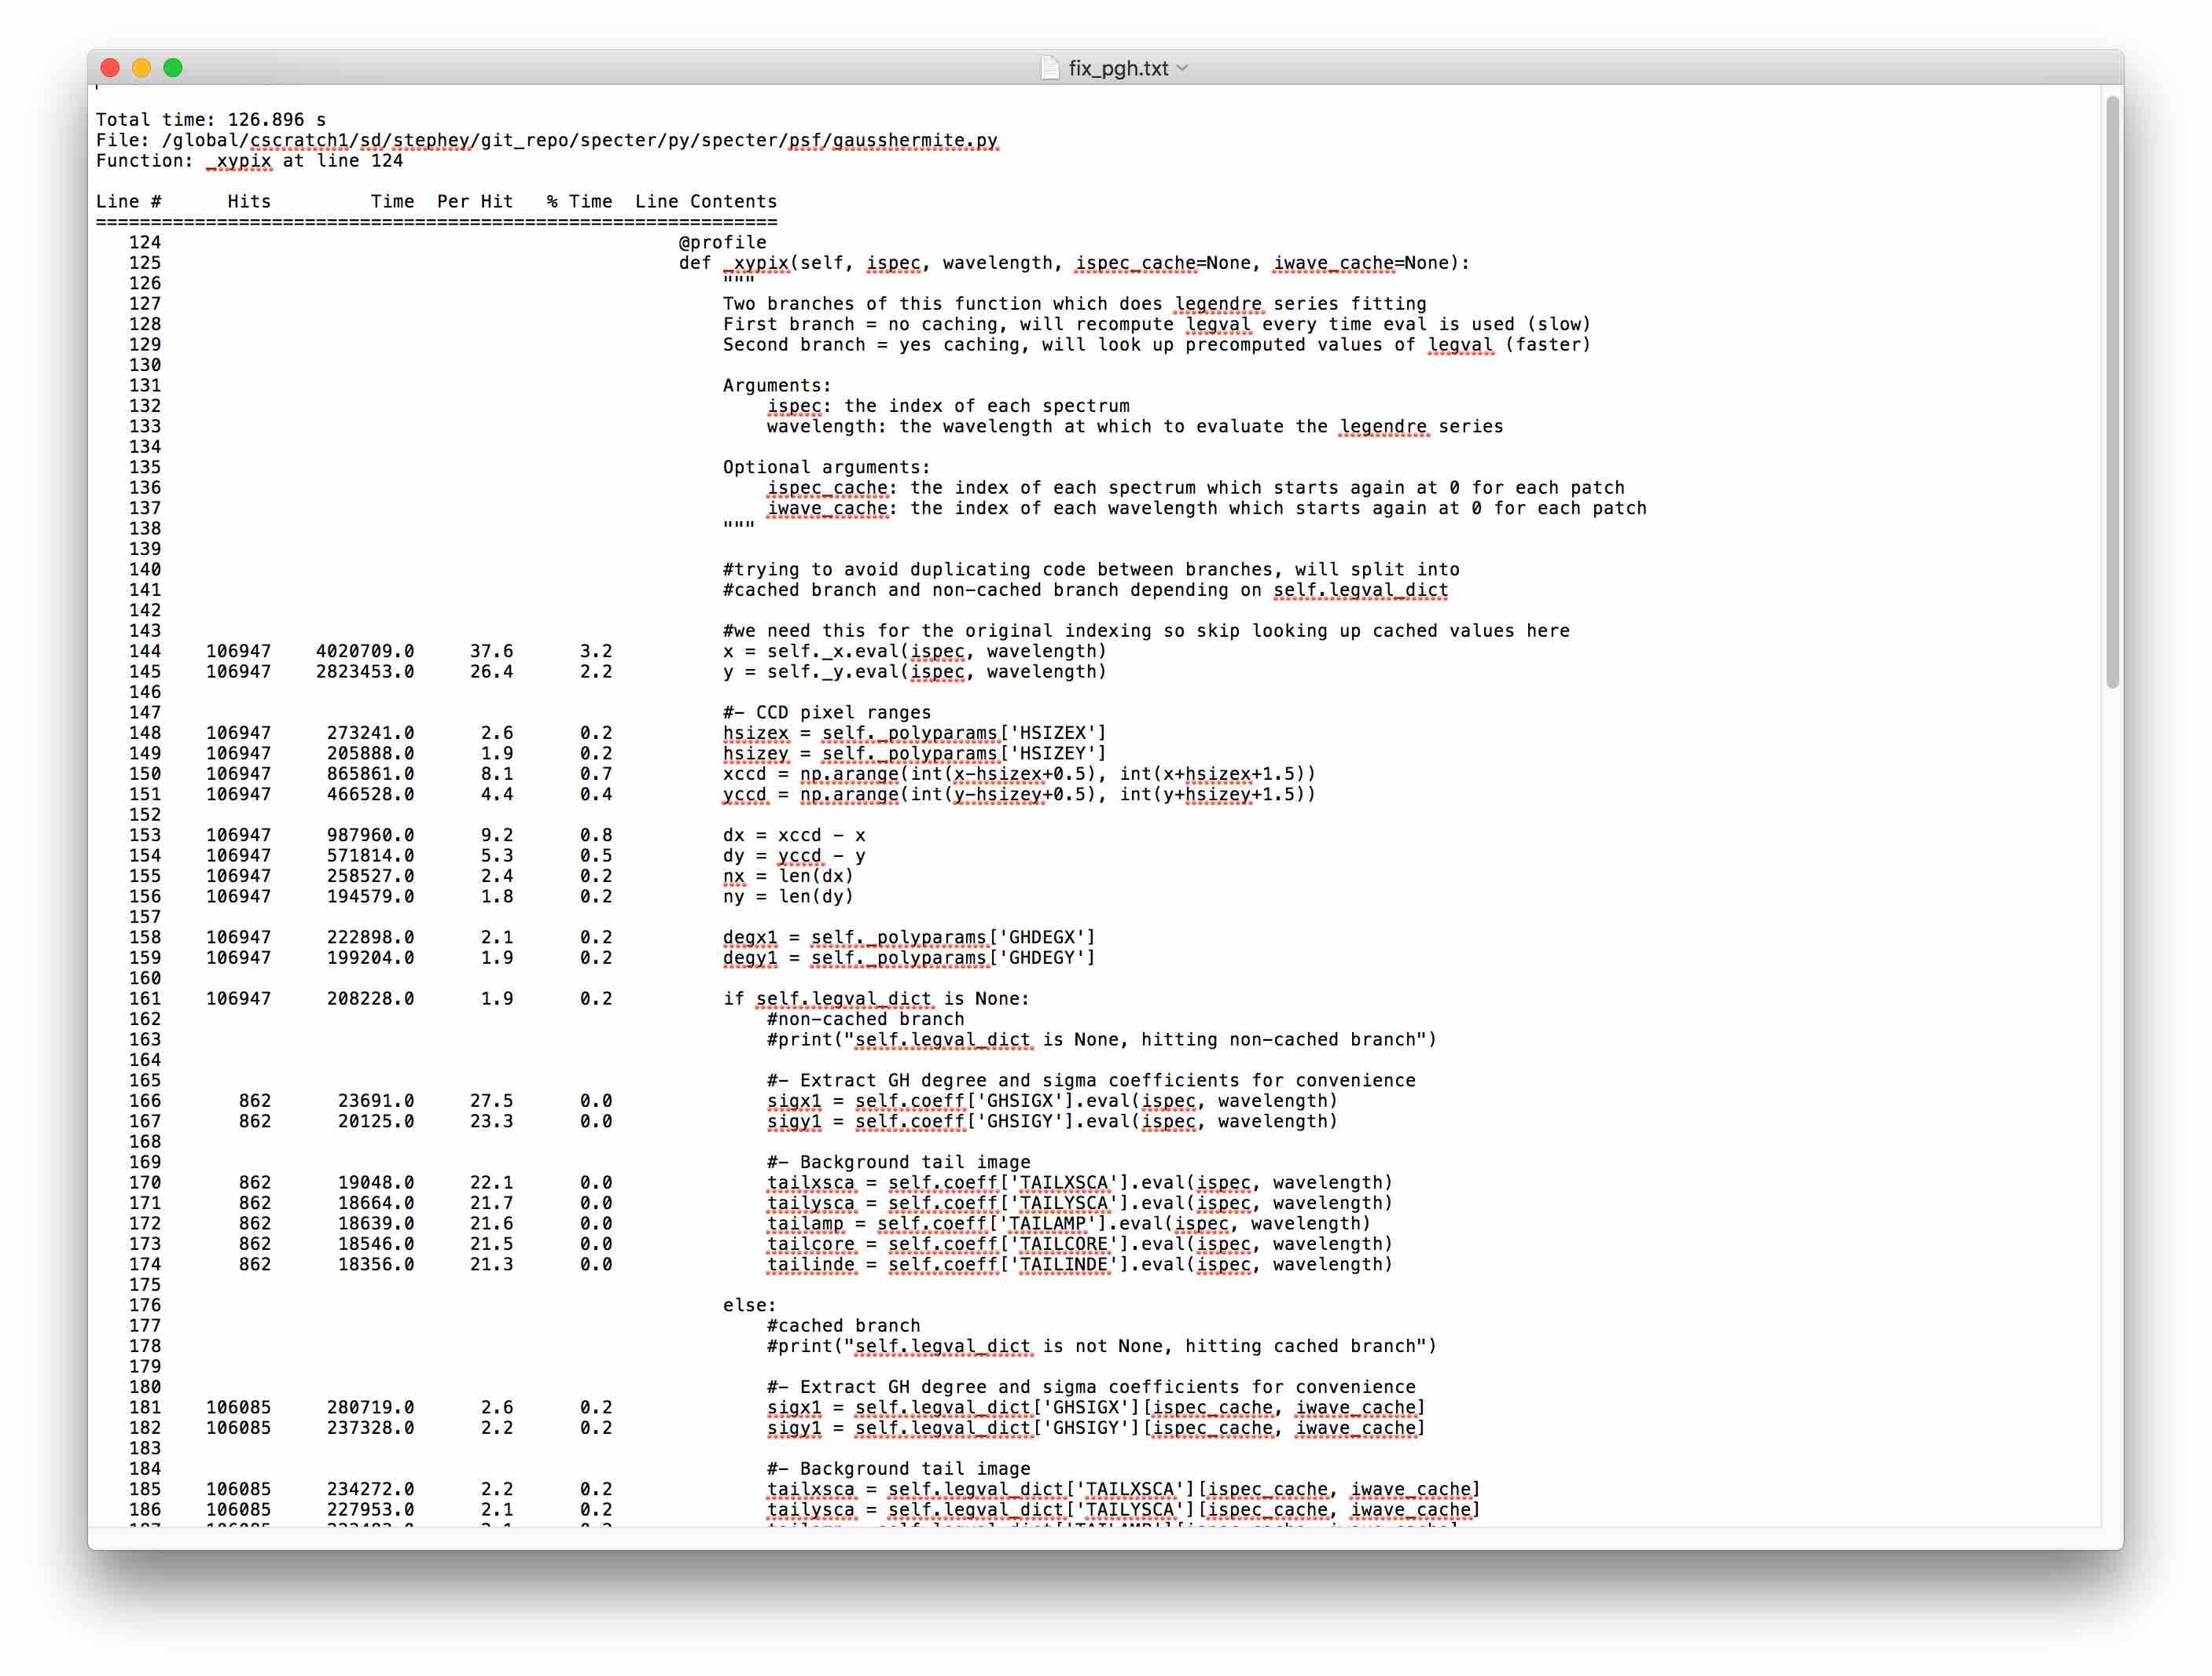 docs/development/high-level-environments/python/line_profiler_xypix.jpg